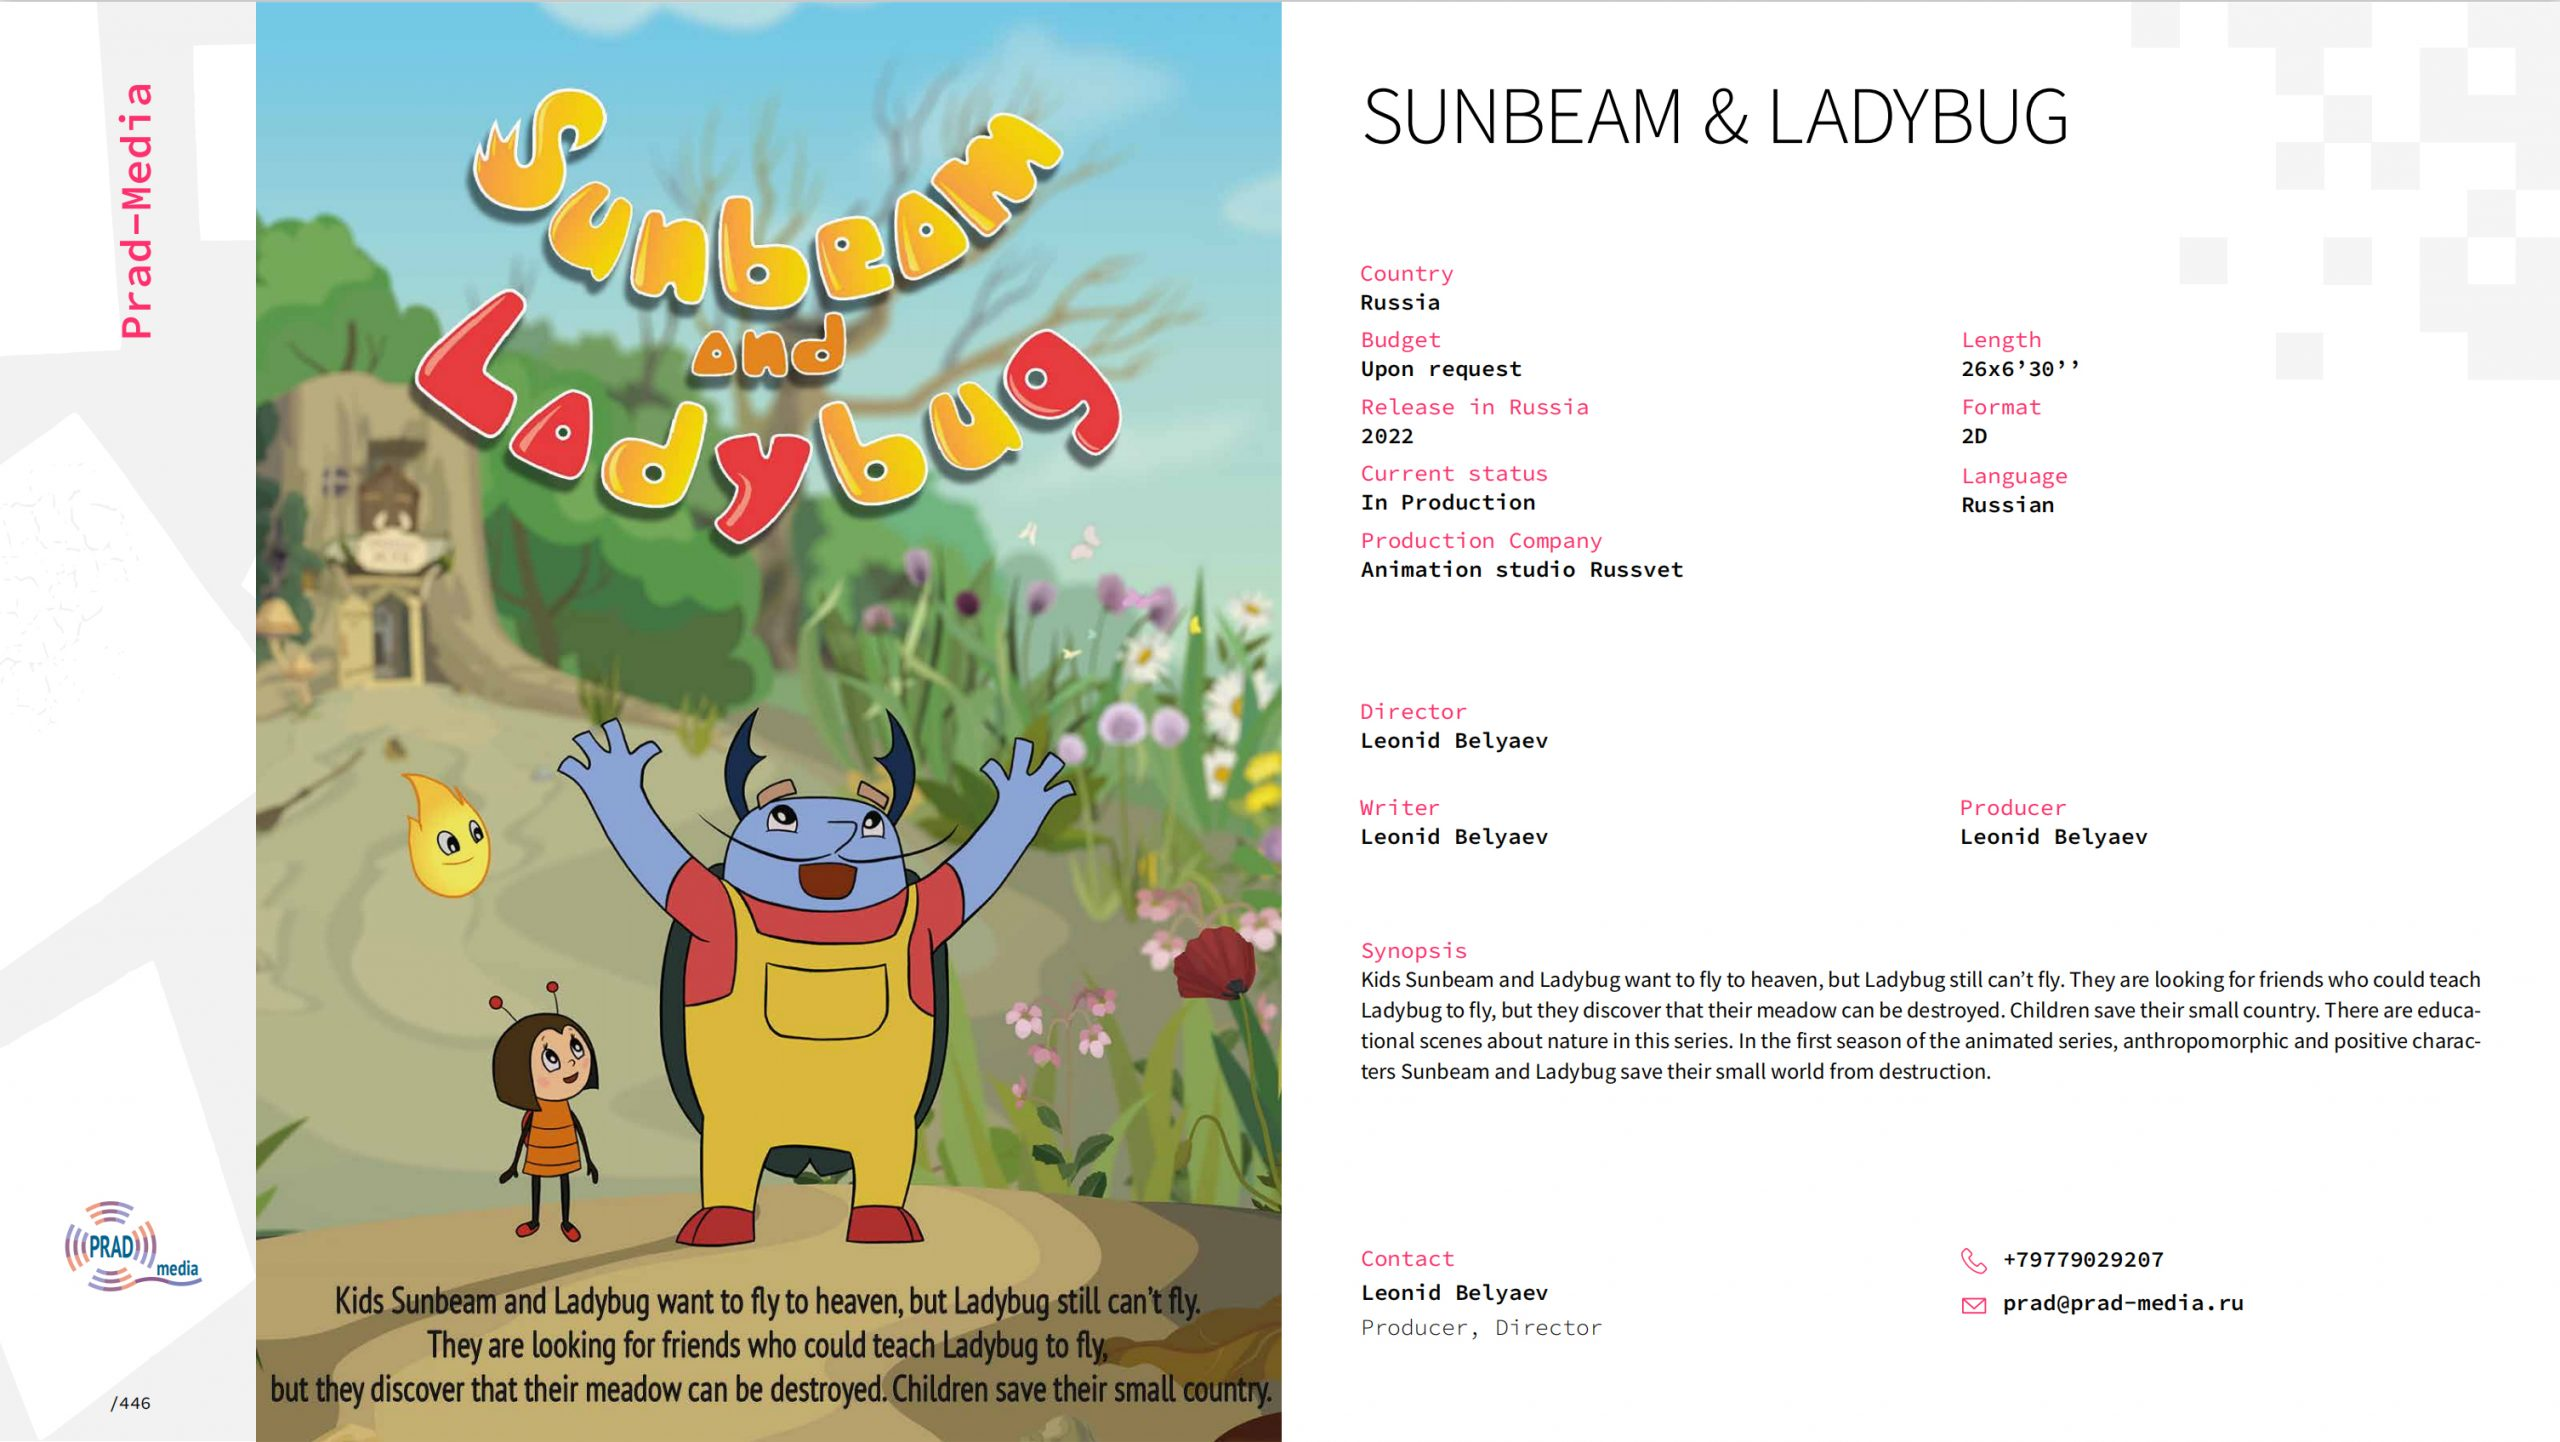 Лучик и Букашечка, Sunbeam & Ladybug